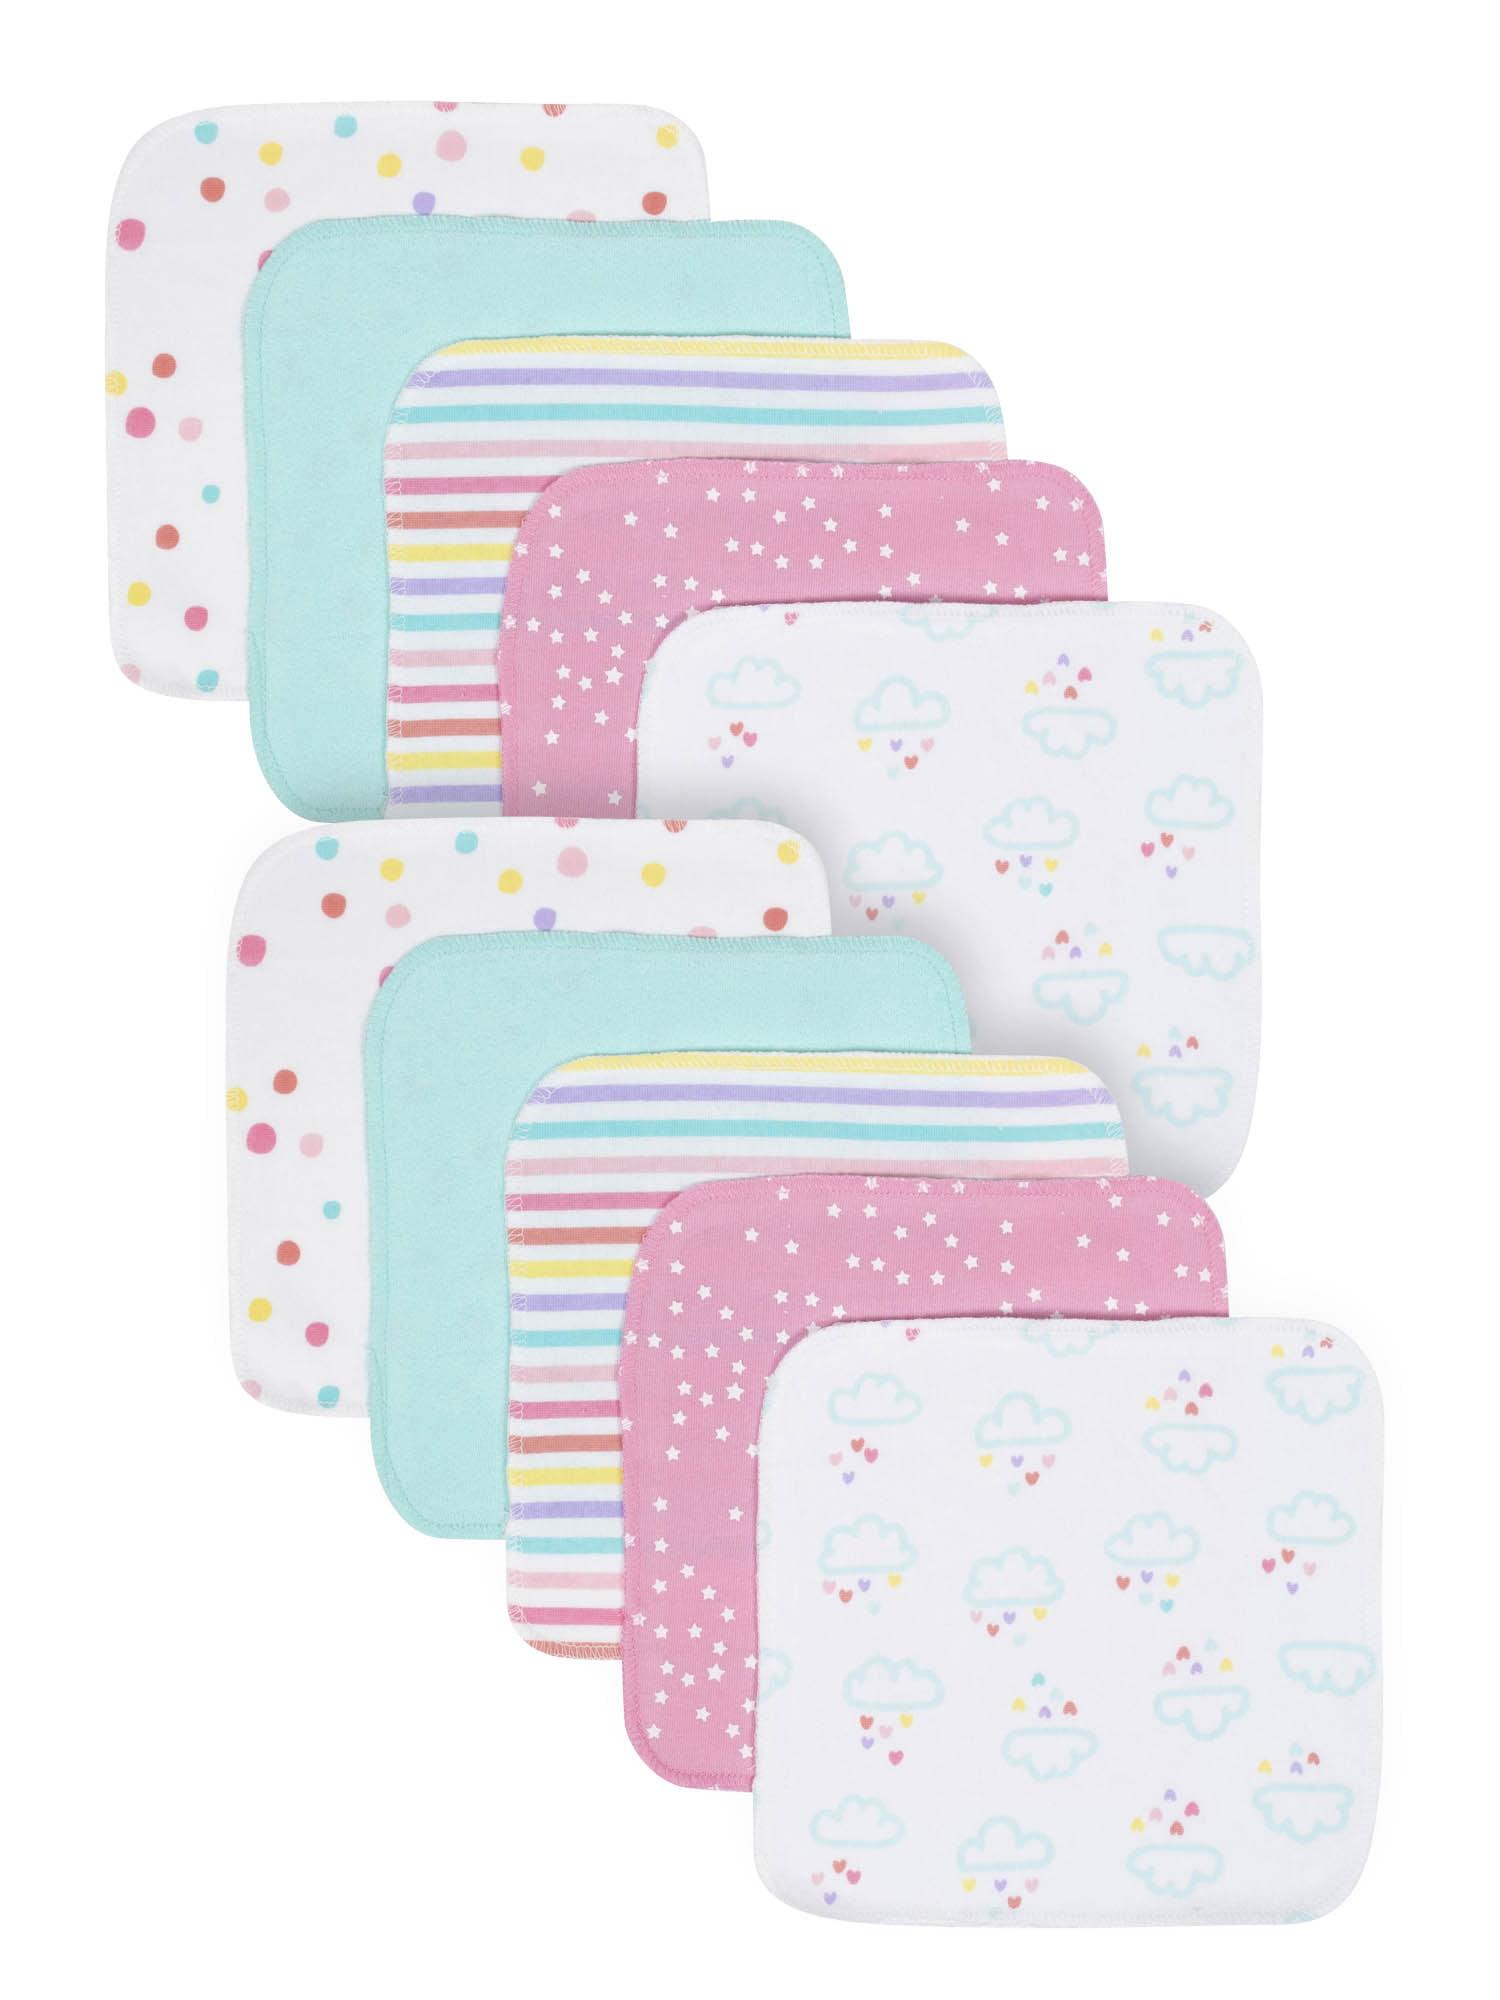 Gerber Organic Cotton Terry Washcloths, 10pk (Baby Girl)